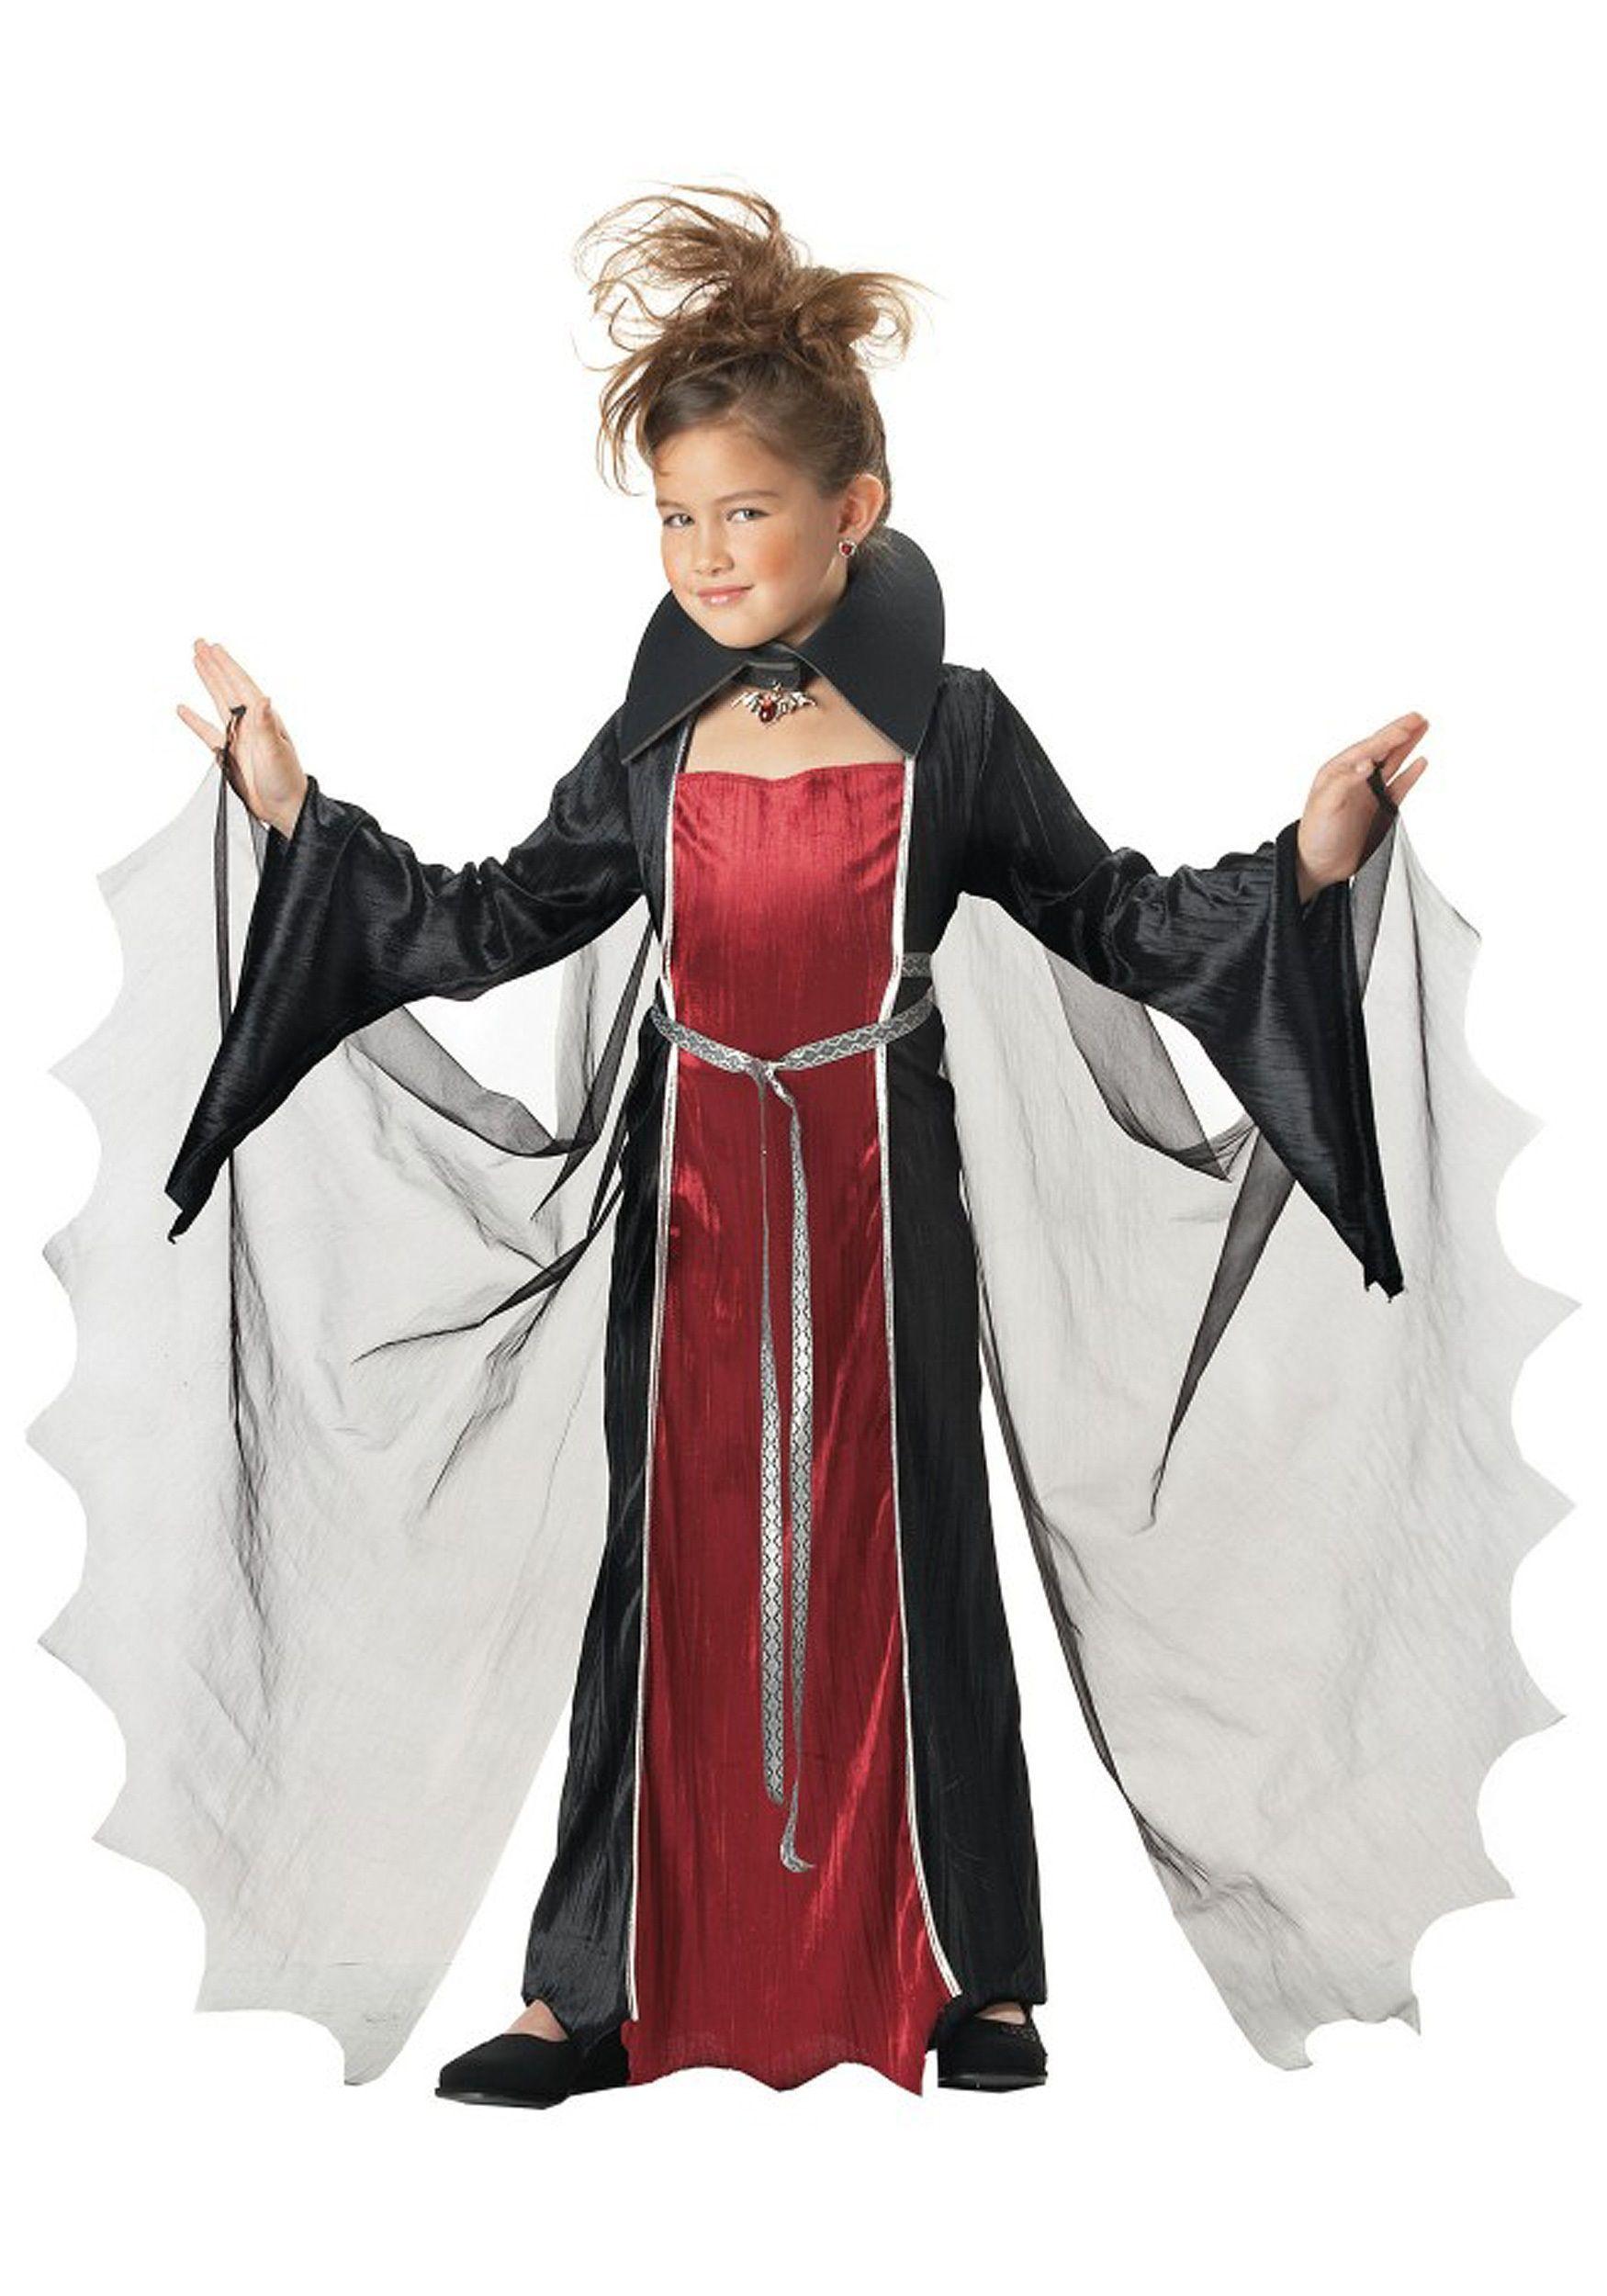 Girls Vampire Costume | Girls vampire costume, Vampire costumes ...